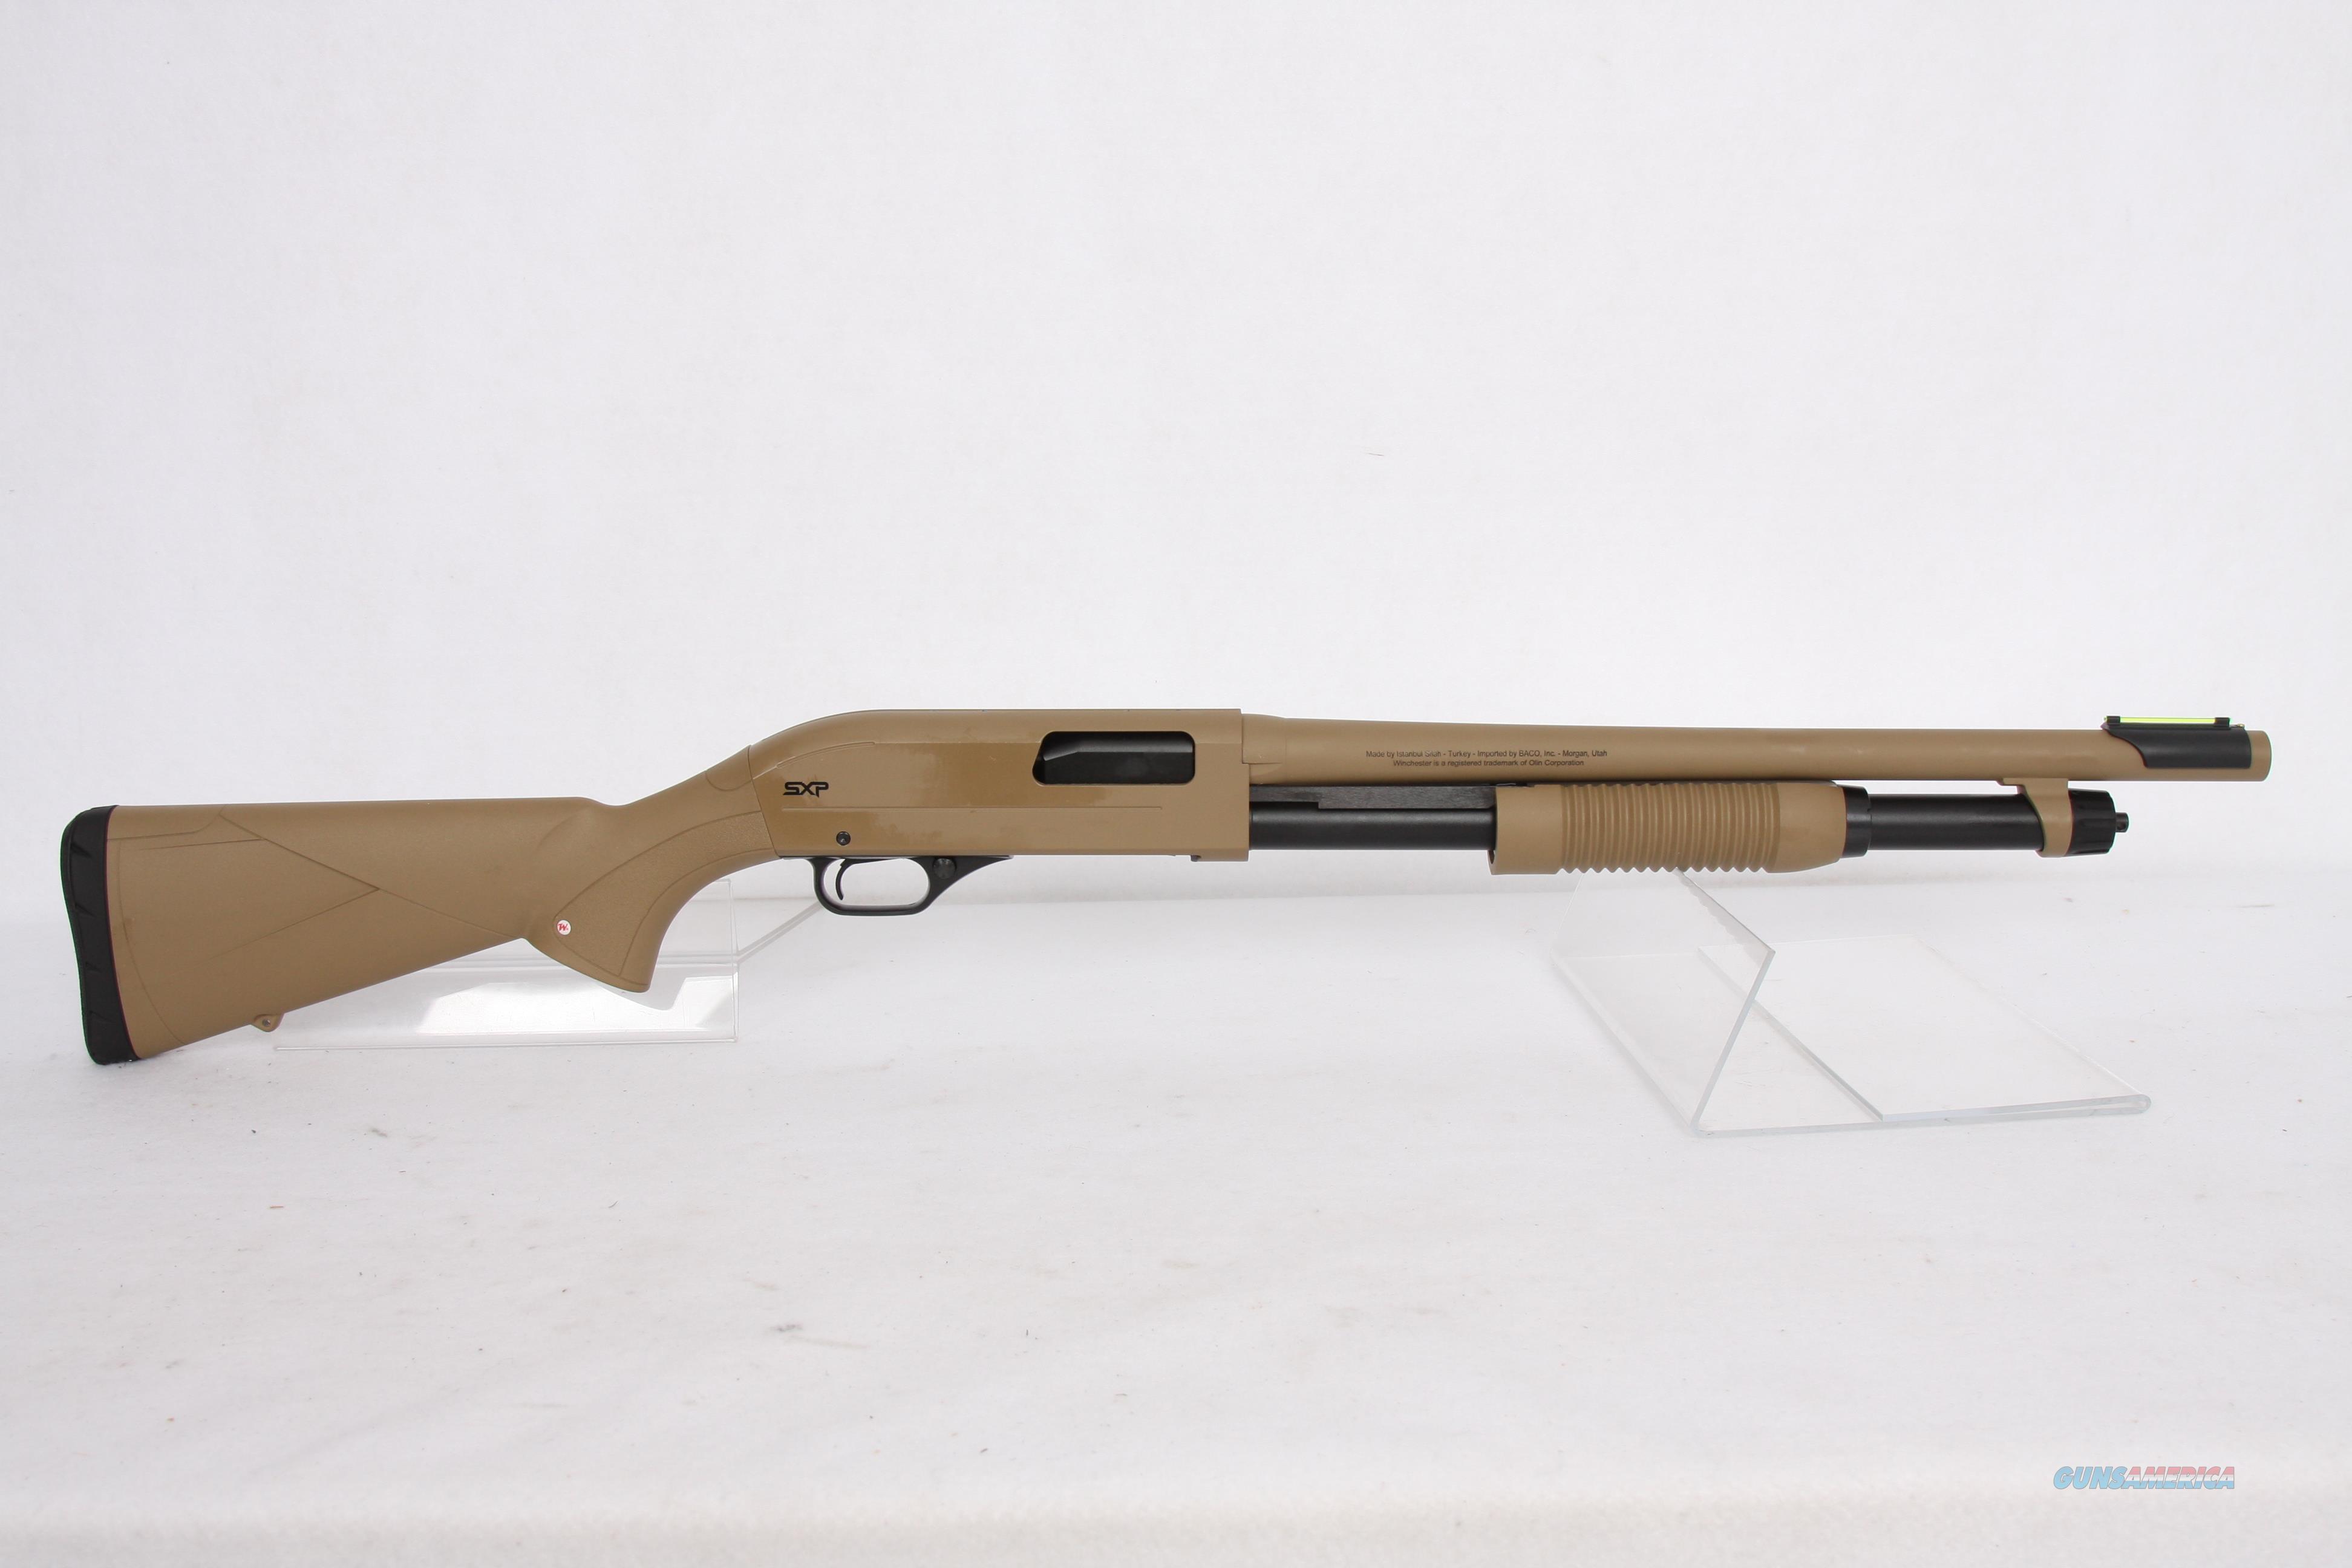 Winchester SXP Dark Earth Defender 12g  Guns > Shotguns > Winchester Shotguns - Modern > Pump Action > Defense/Tactical